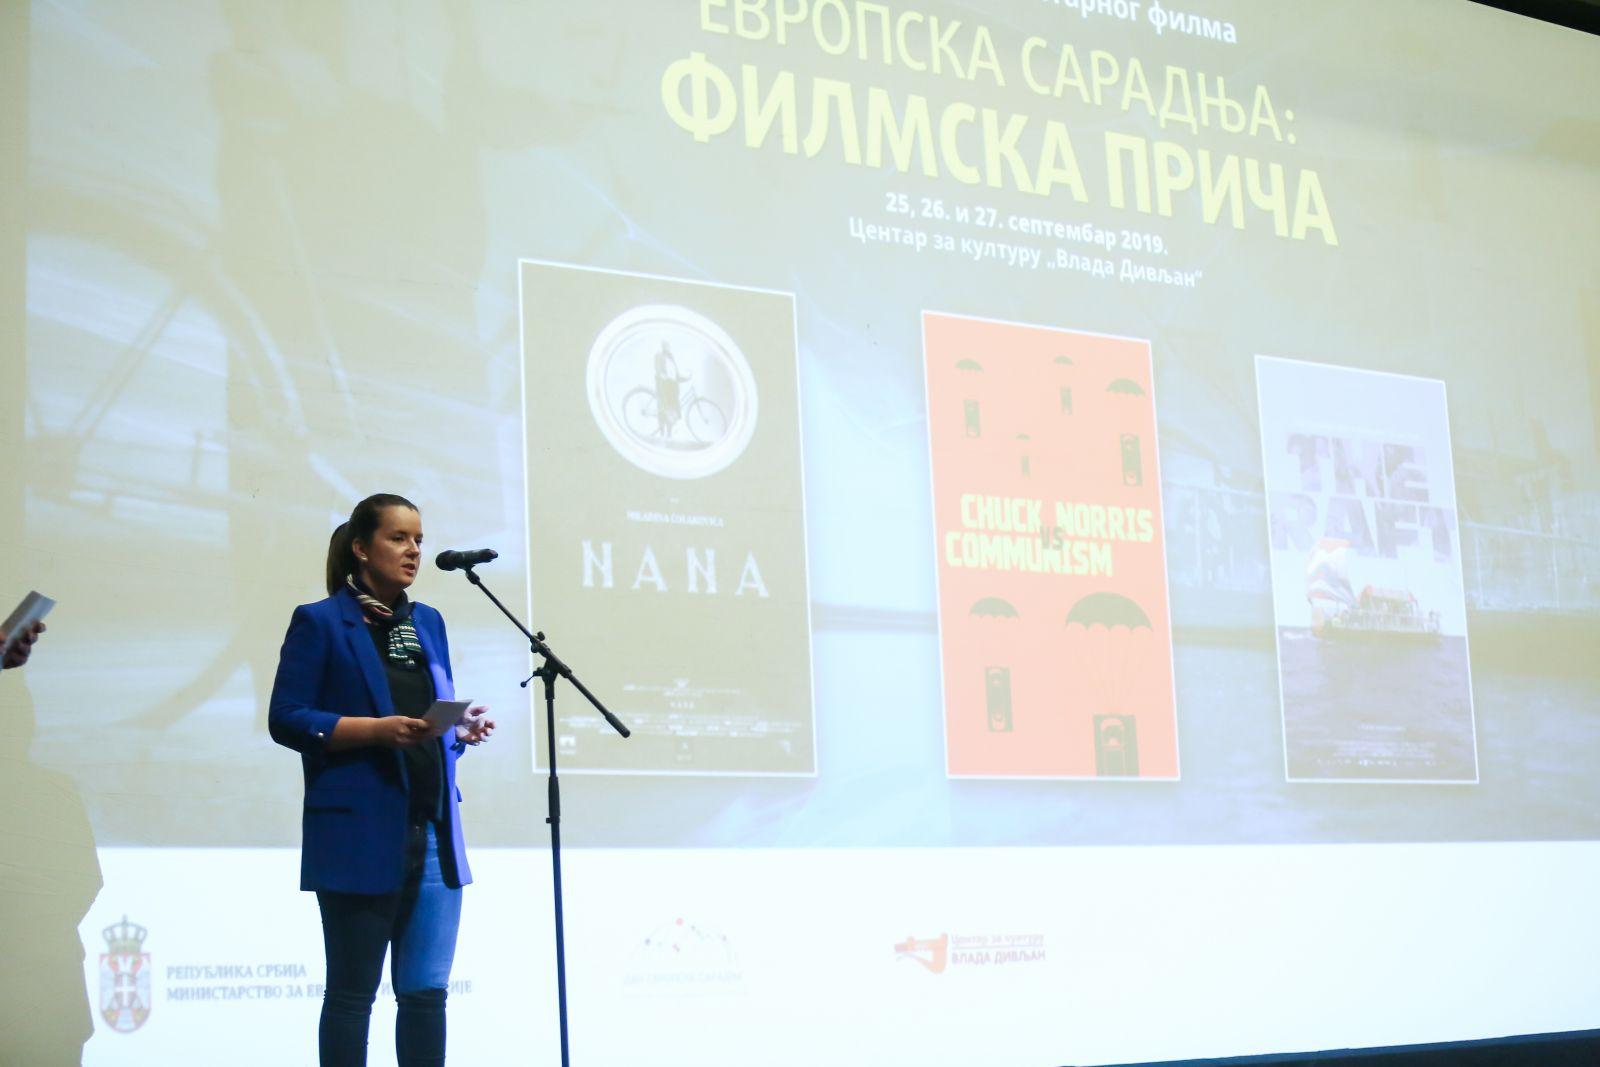 Film 'Nana' opened the festival 'European Cooperation: Film Story'